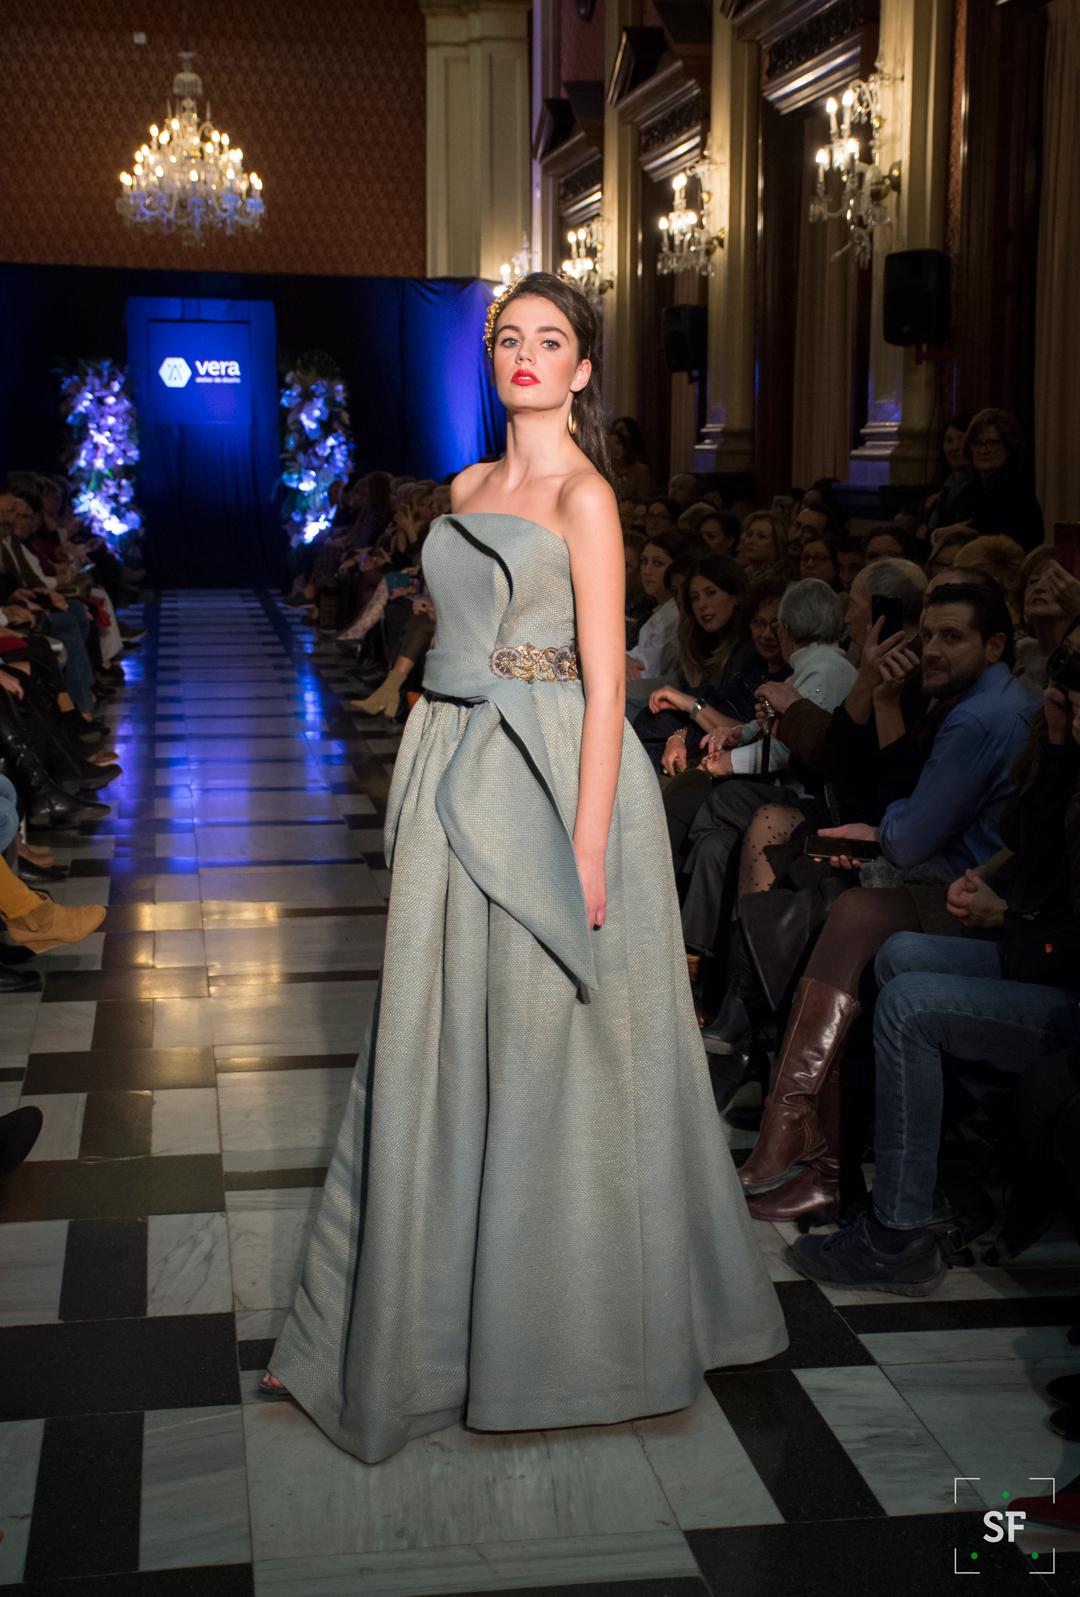 moda-fotógrafo-valencia-desfile-modelo-glamour-fashion-sanchofotografia-vestidos-modavalencia-ruzafa-beauty